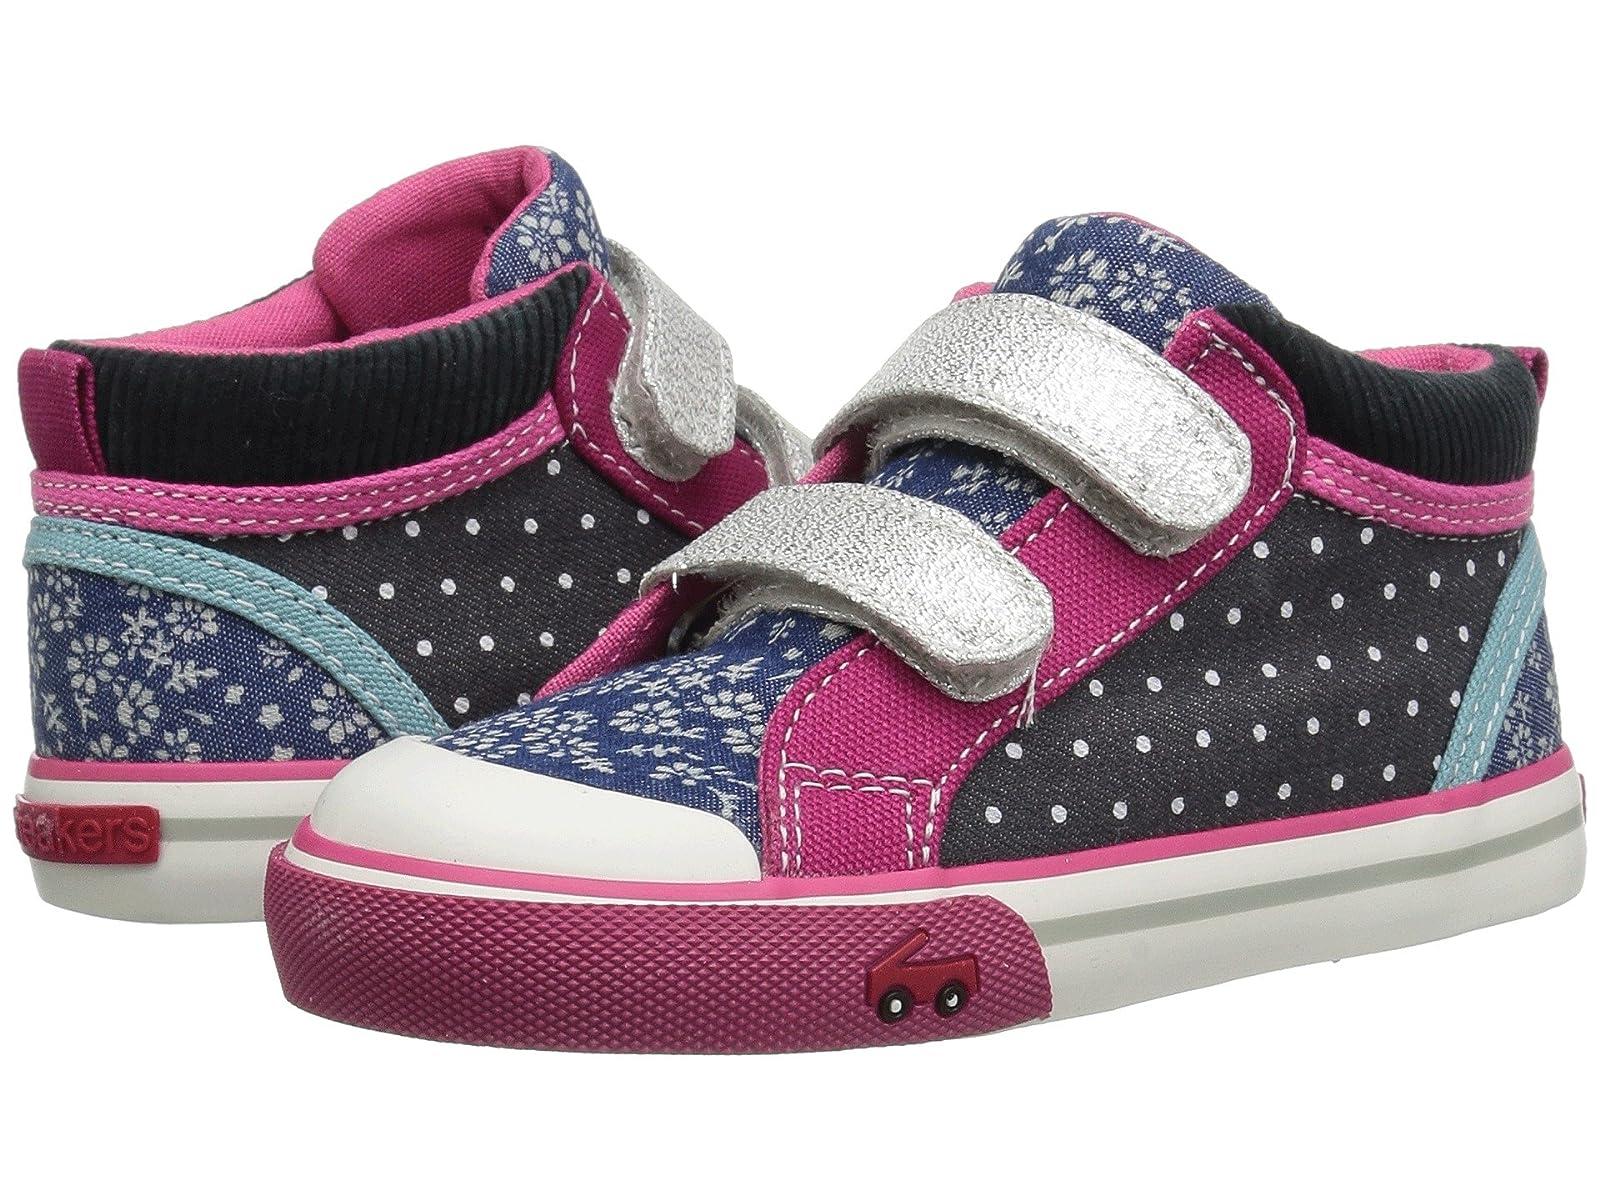 See Kai Run Kids Kya (Toddler/Little Kid)Atmospheric grades have affordable shoes